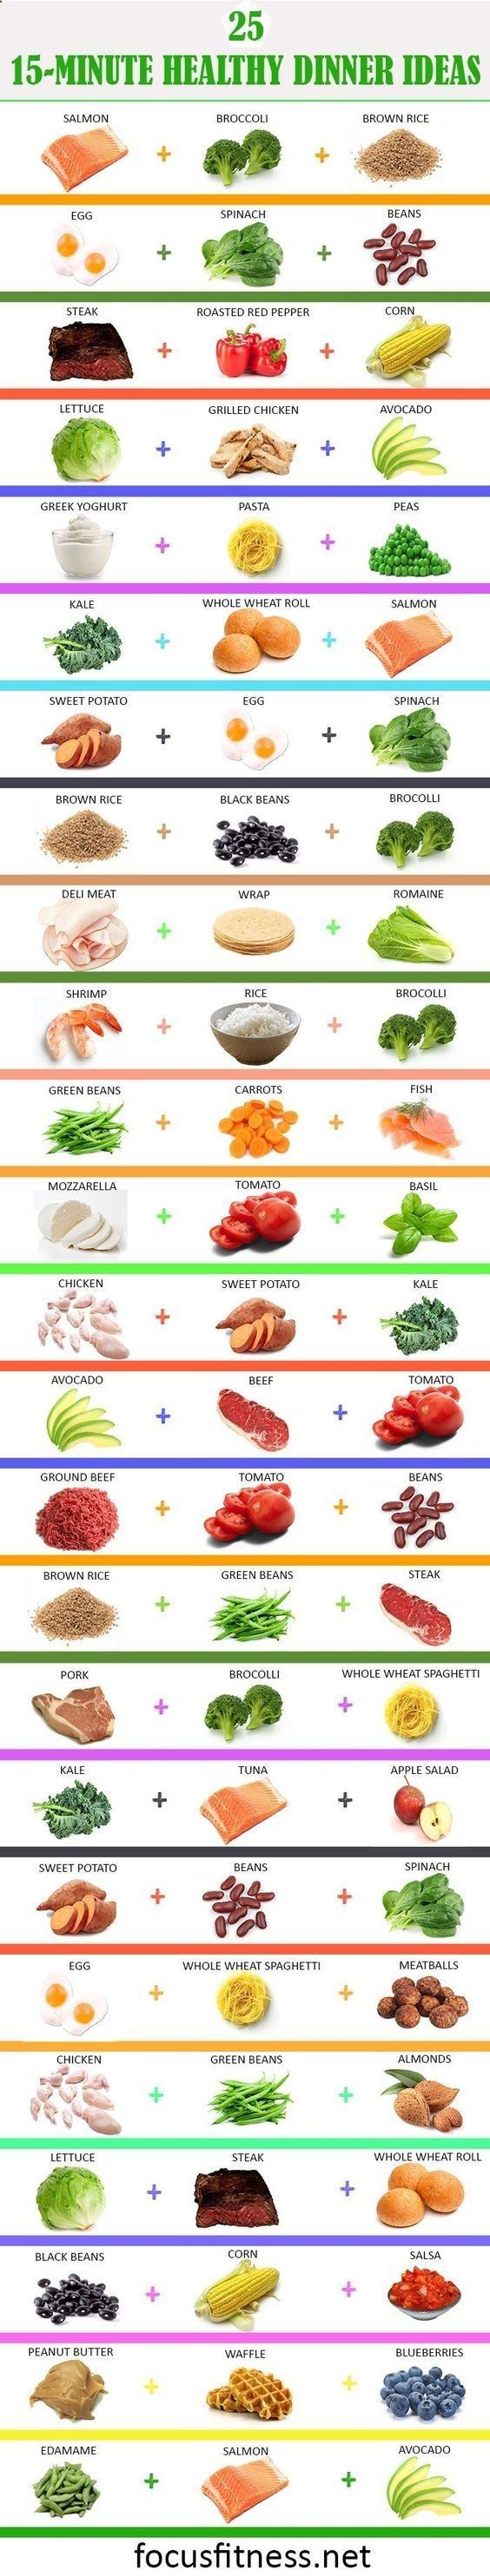 diet plan for acute gastritis